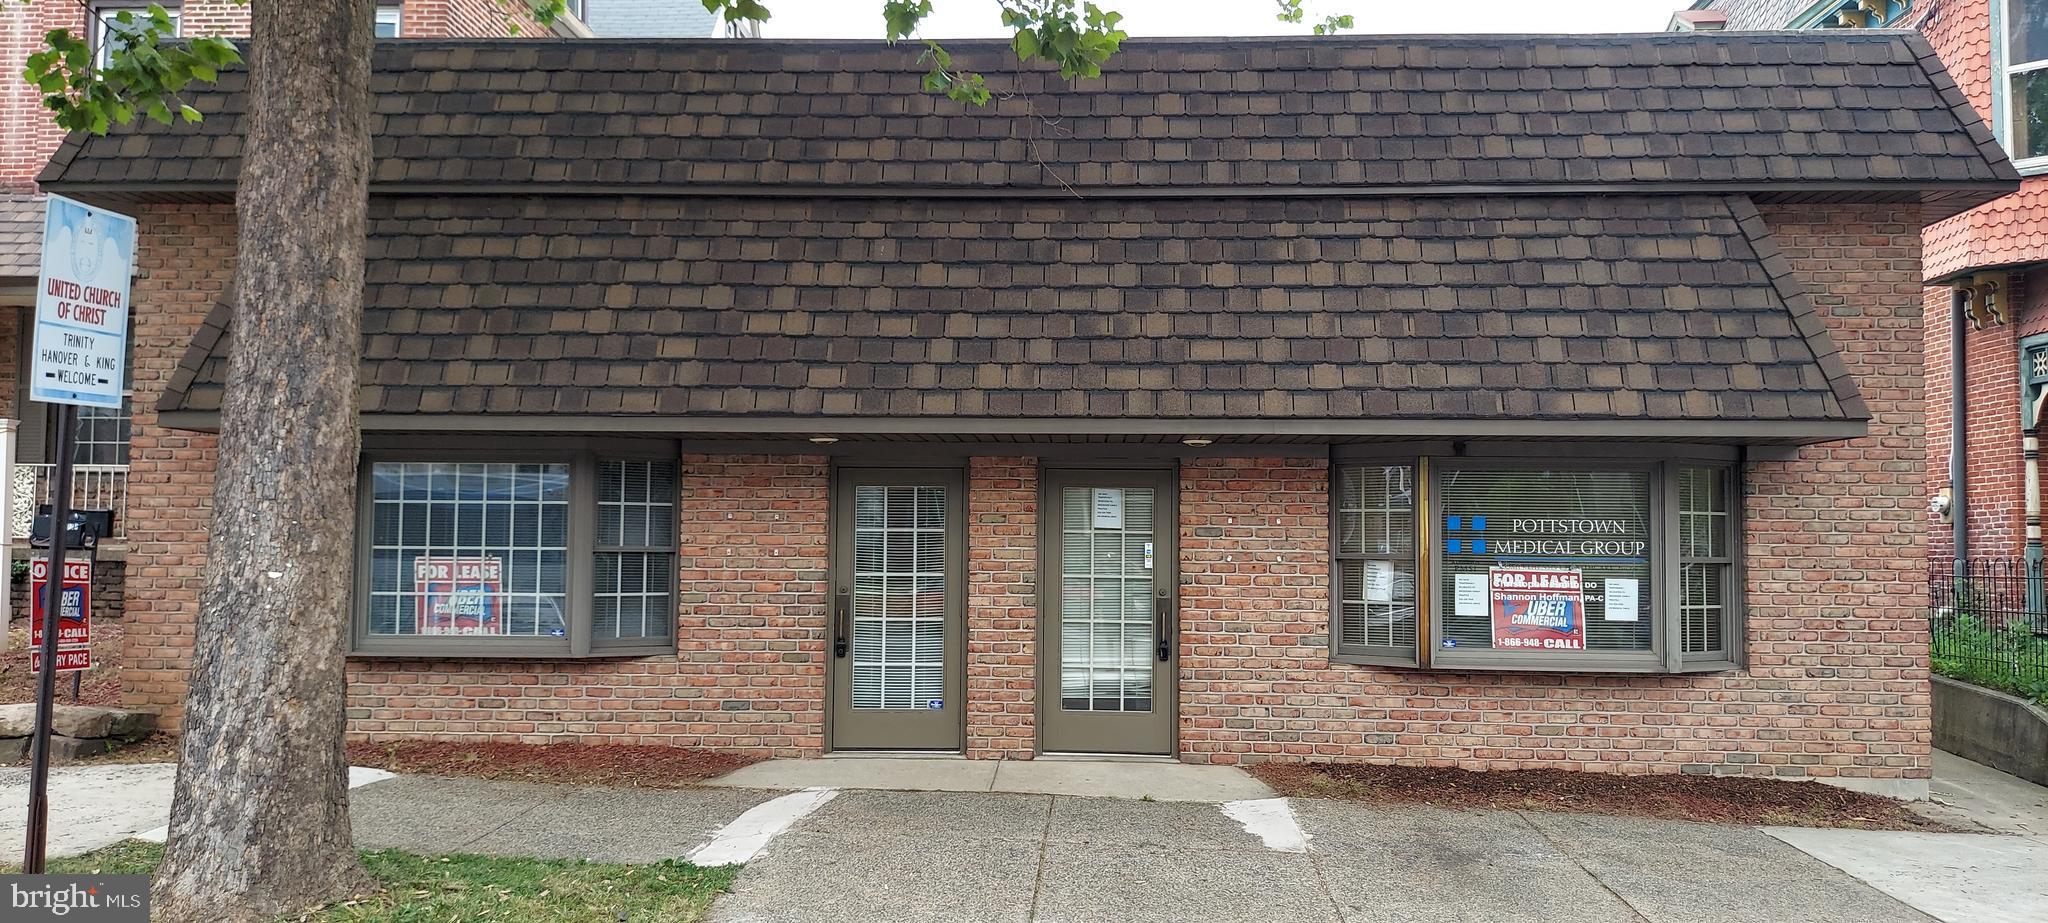 545 E High St., Pottstown, PA 19464